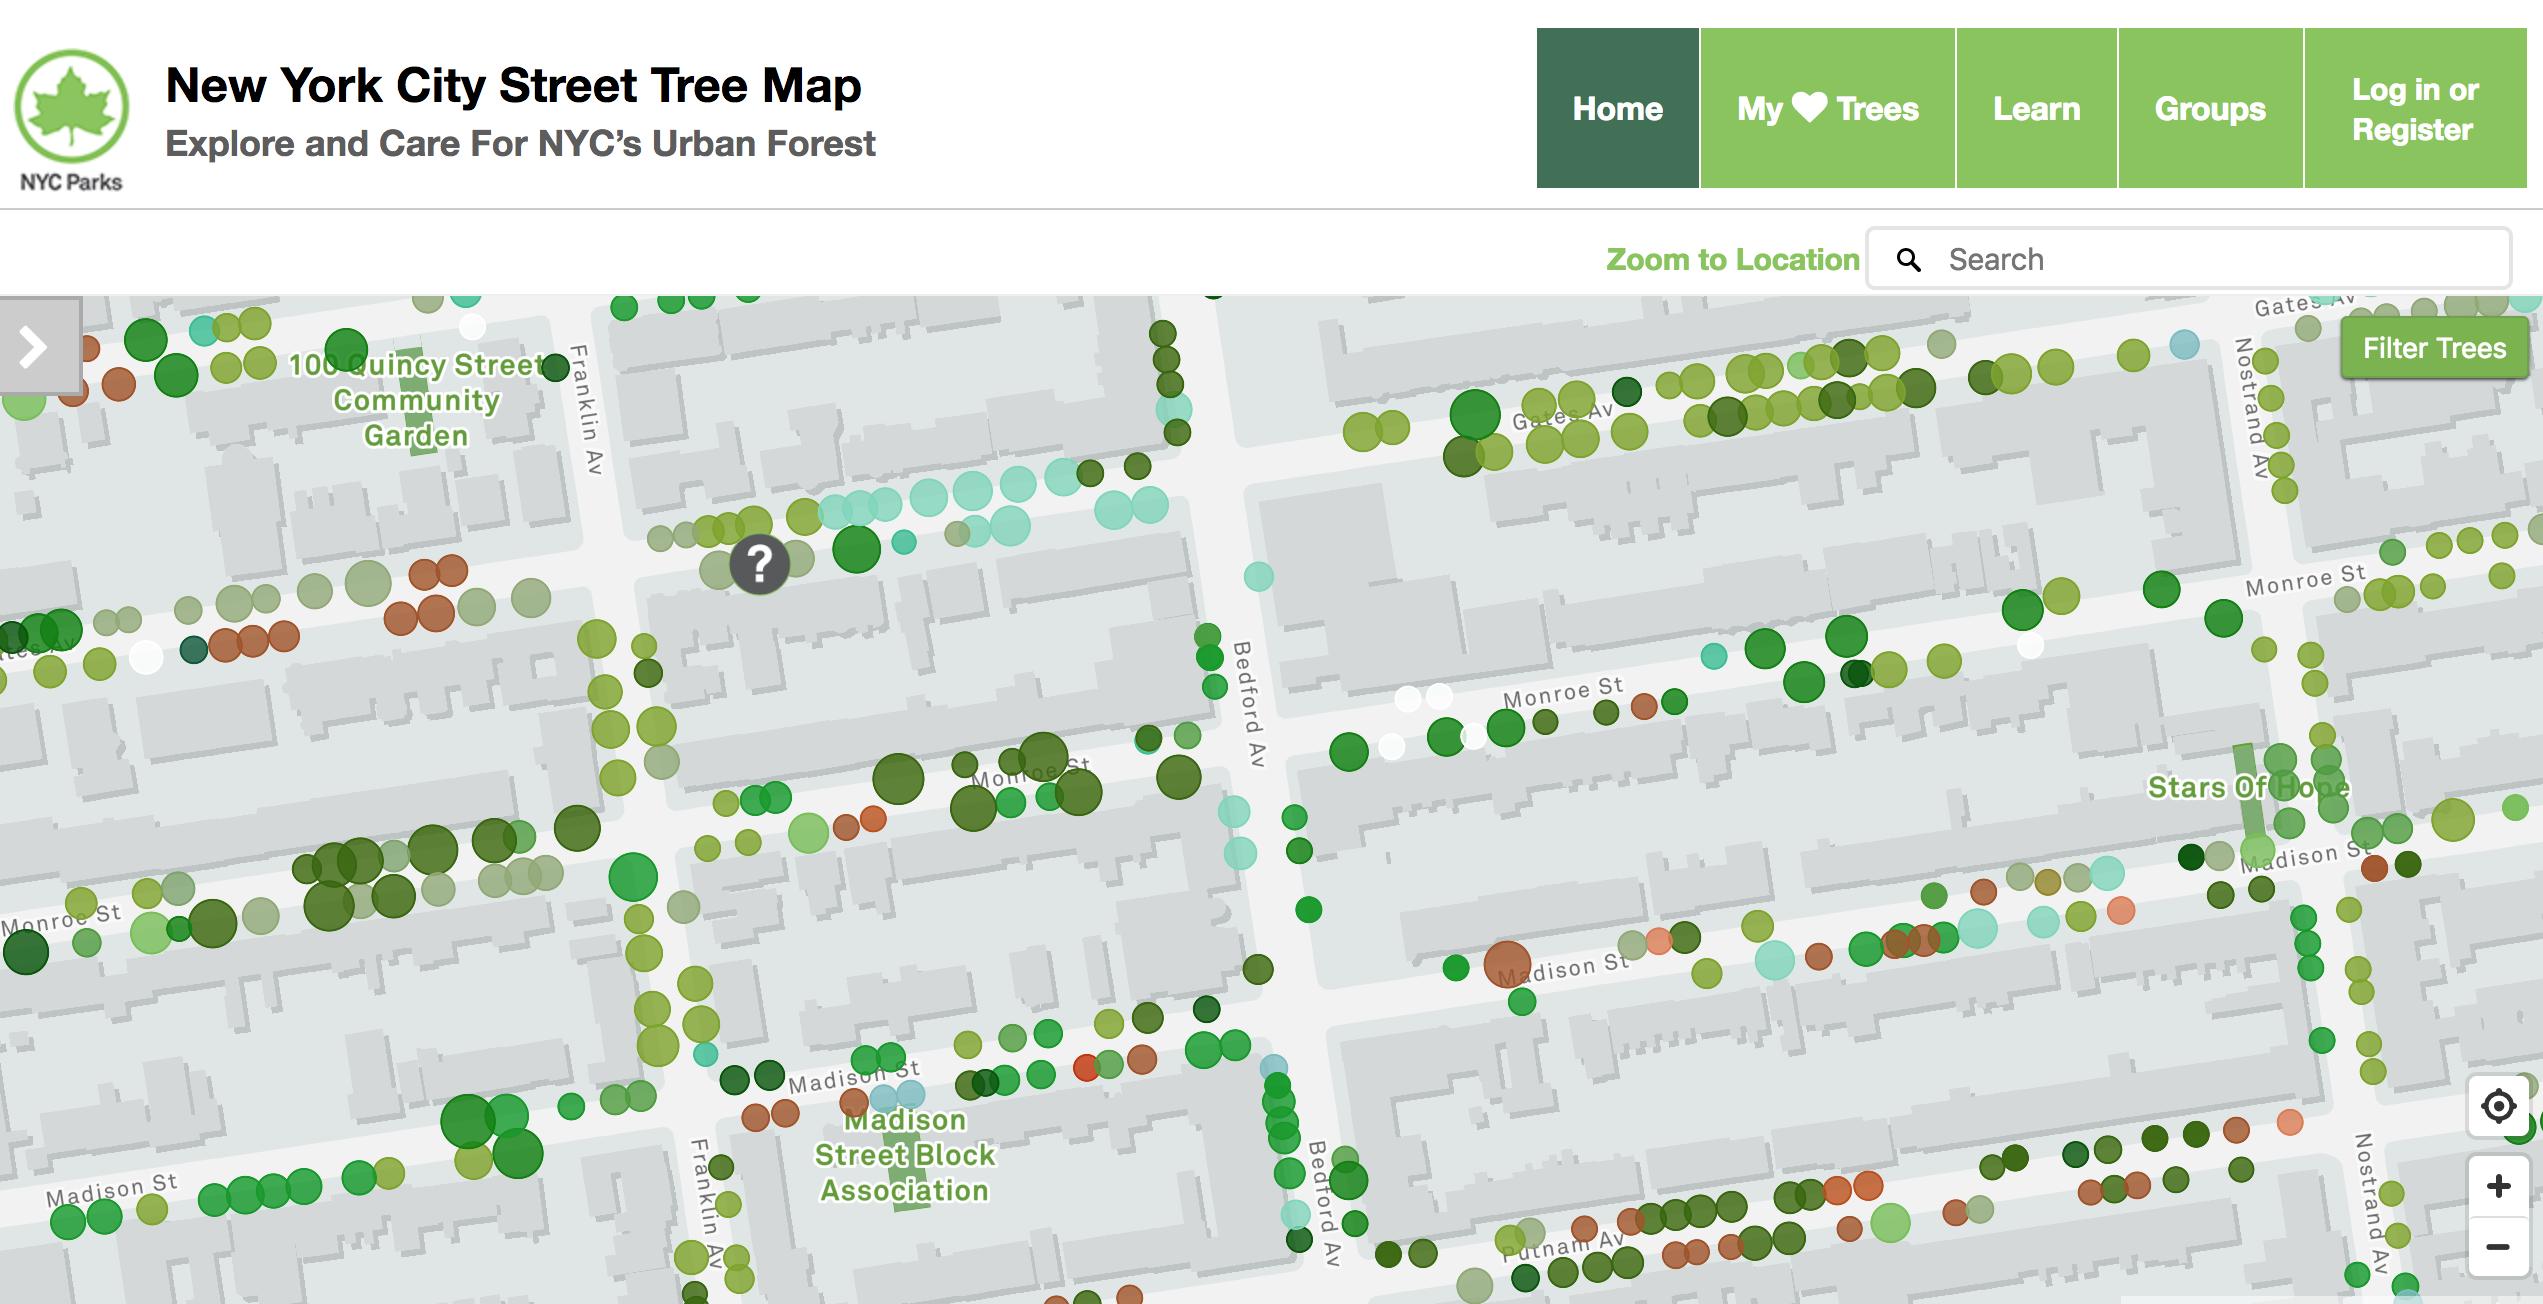 карта деревьев